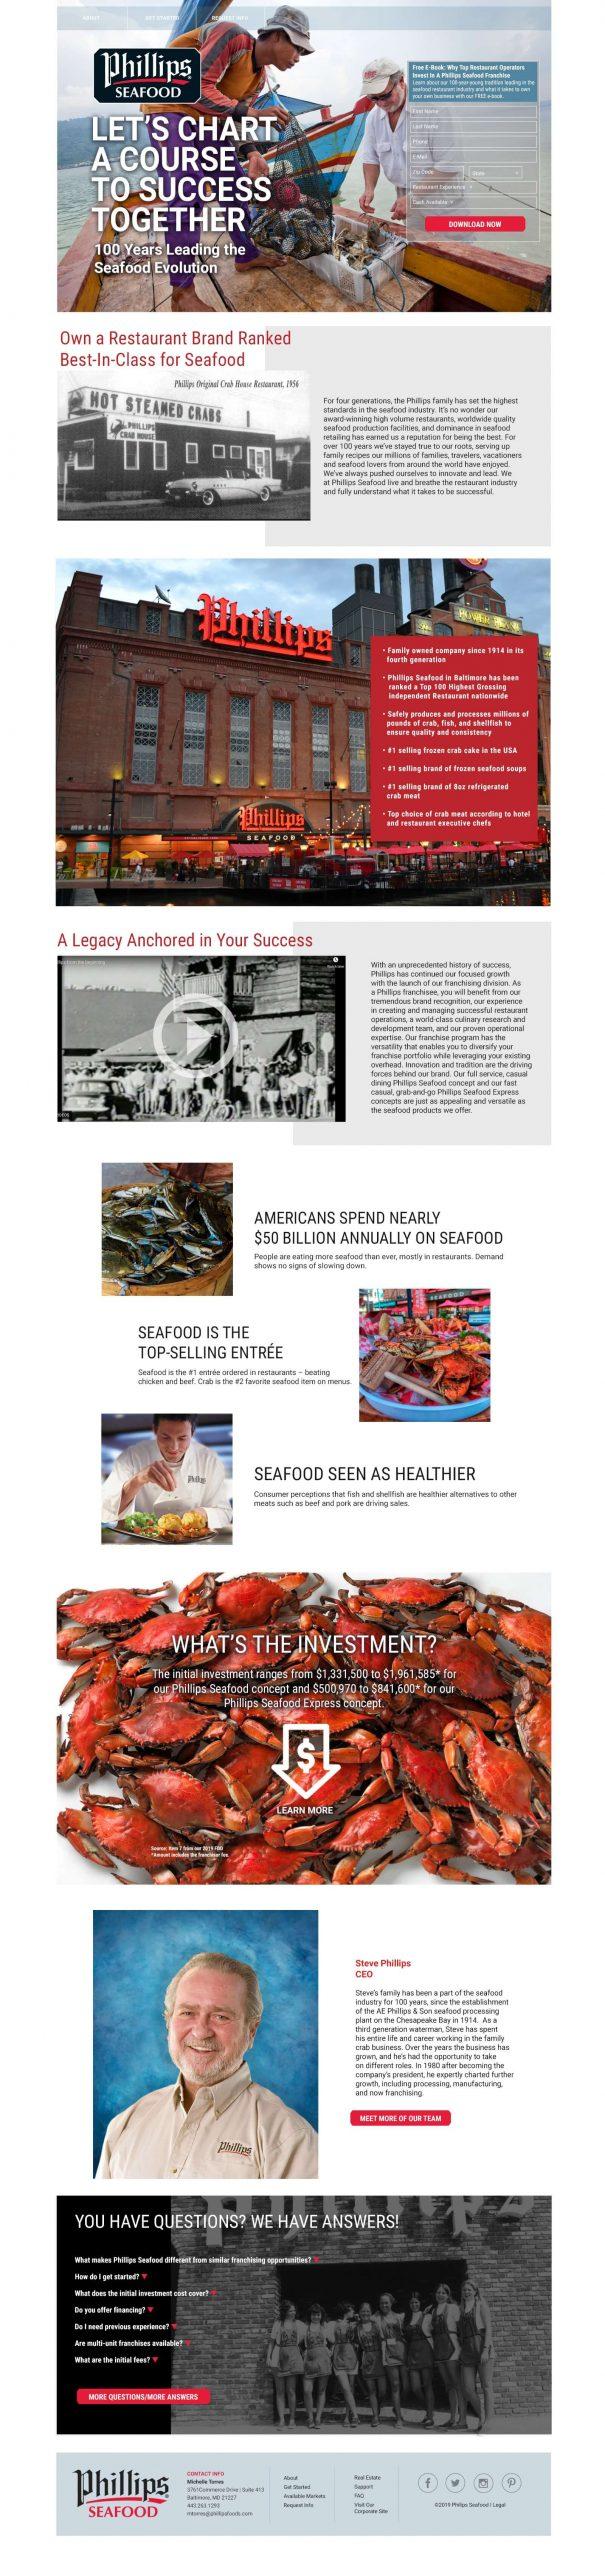 phillips seafood website